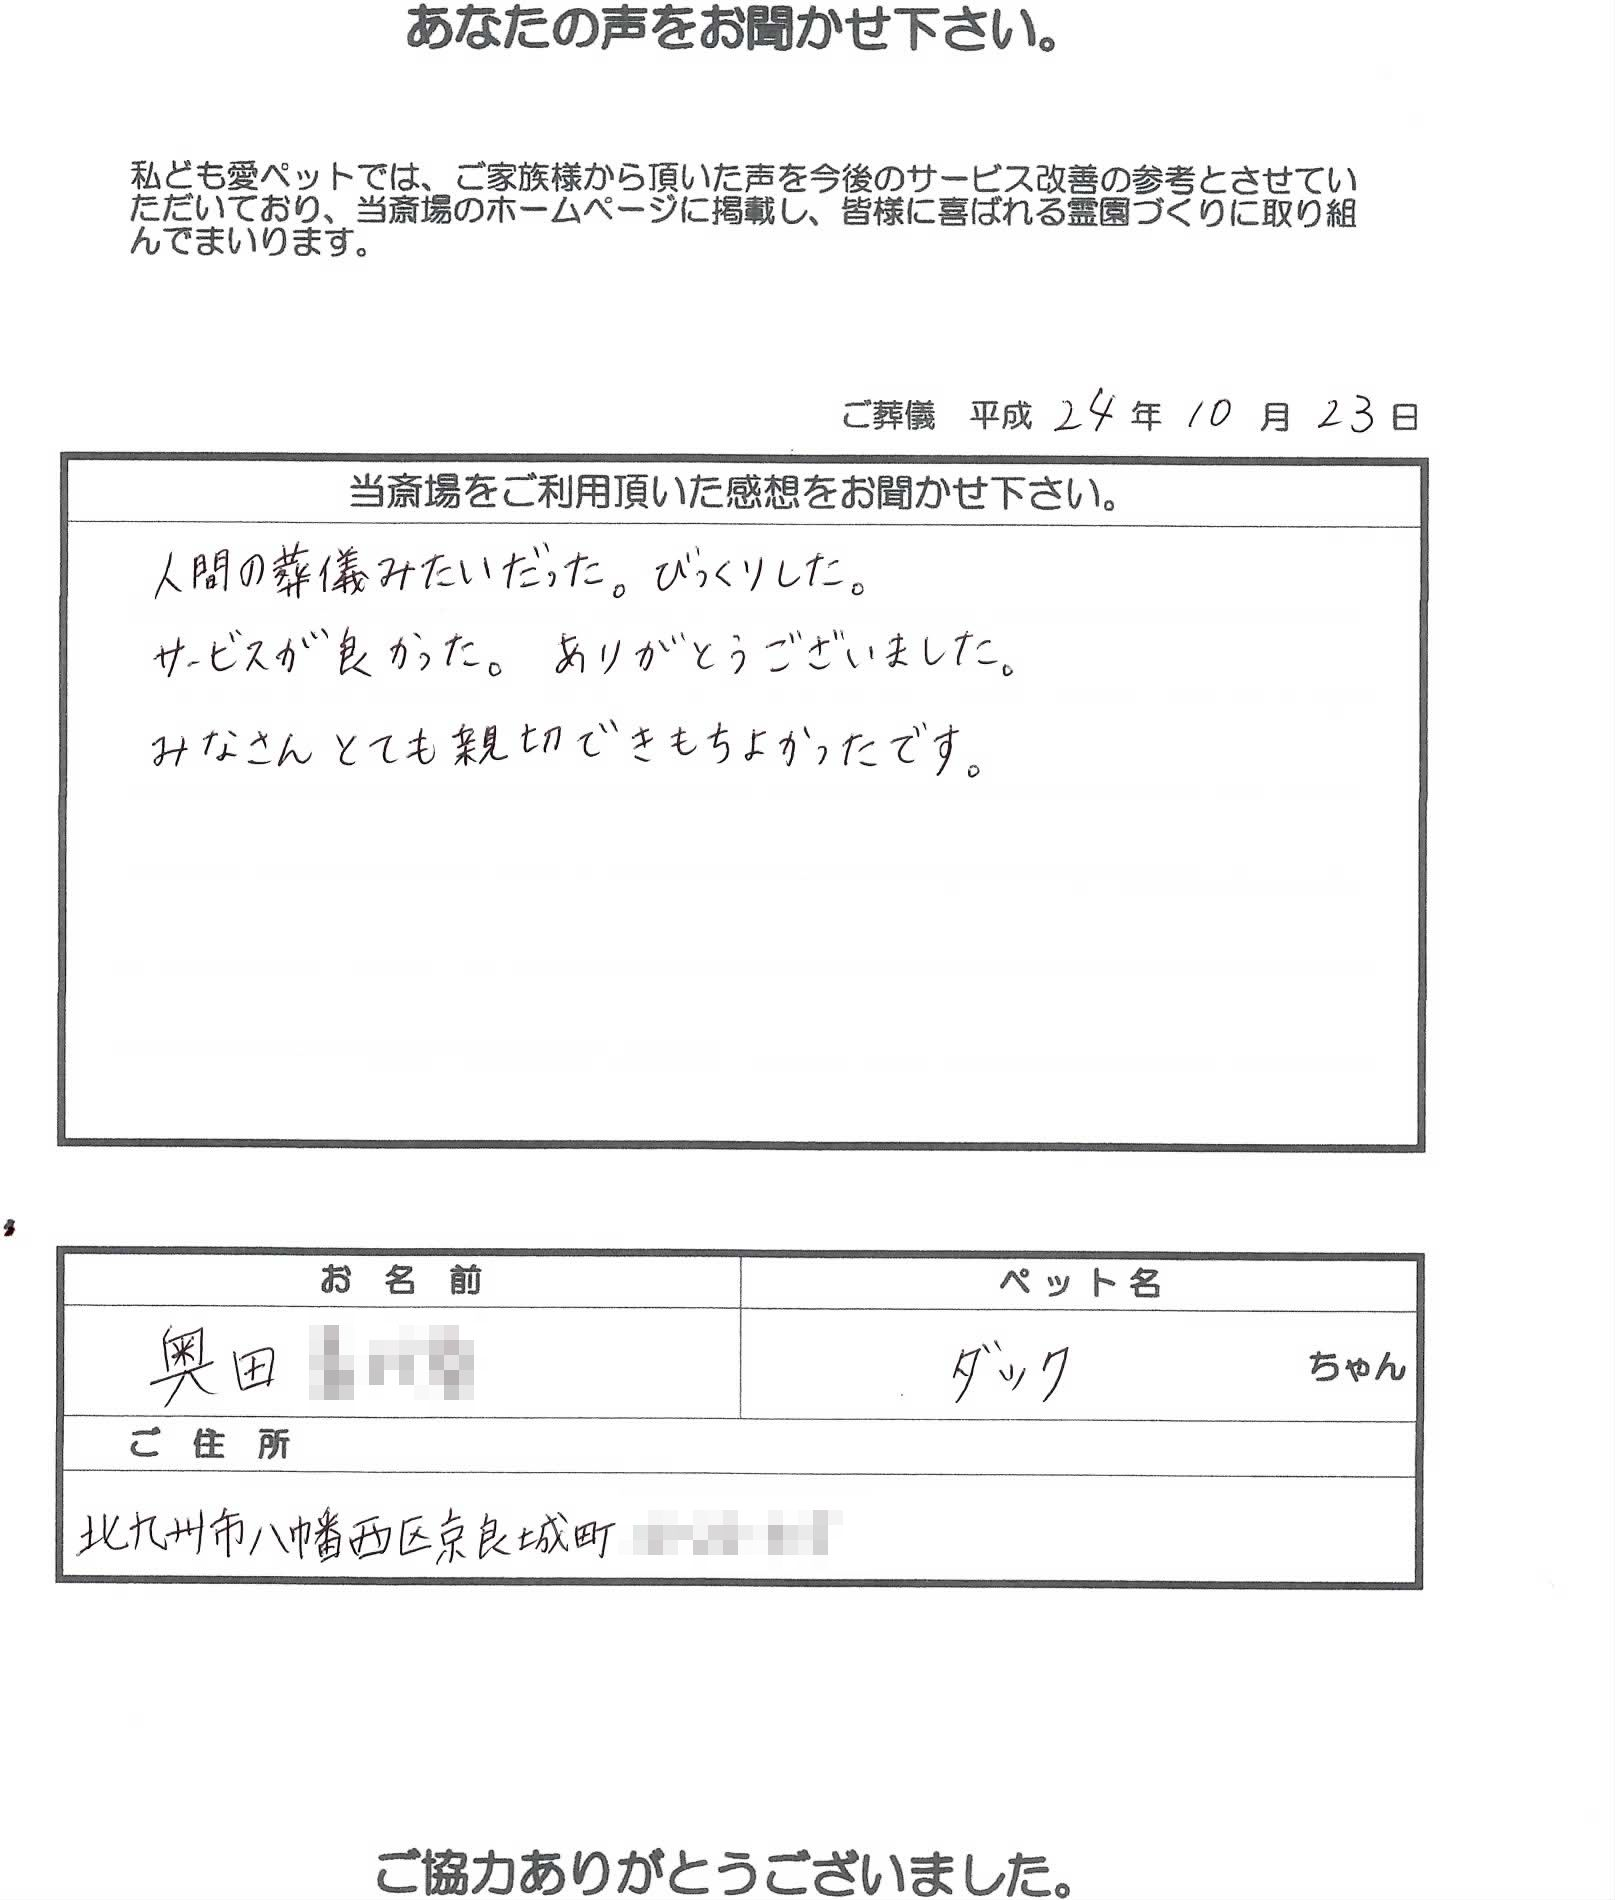 k121023-3.jpg